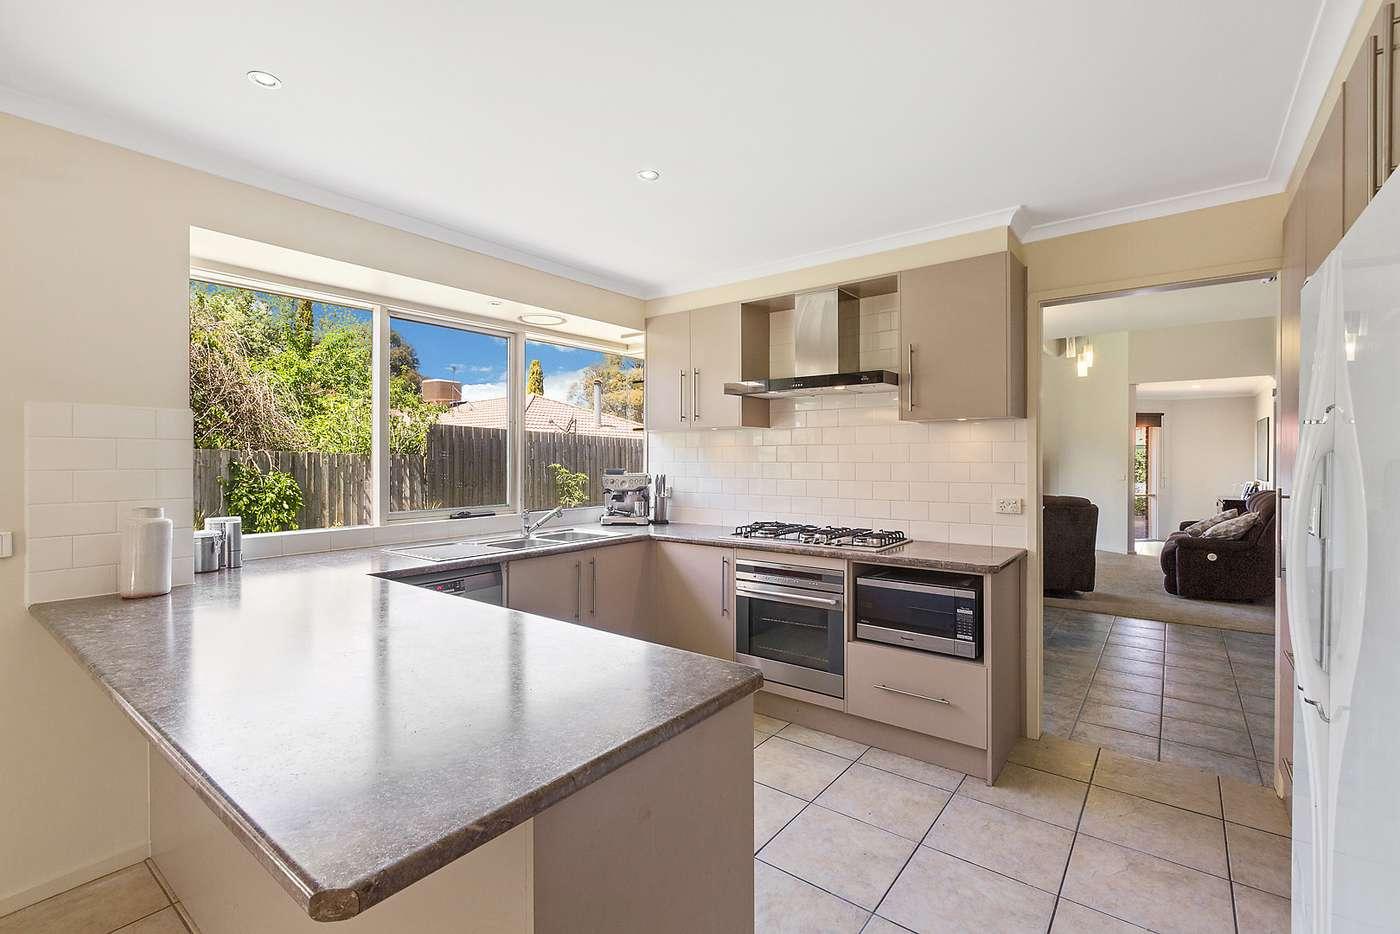 Sixth view of Homely house listing, 14 Wildwood Walk, Croydon South VIC 3136